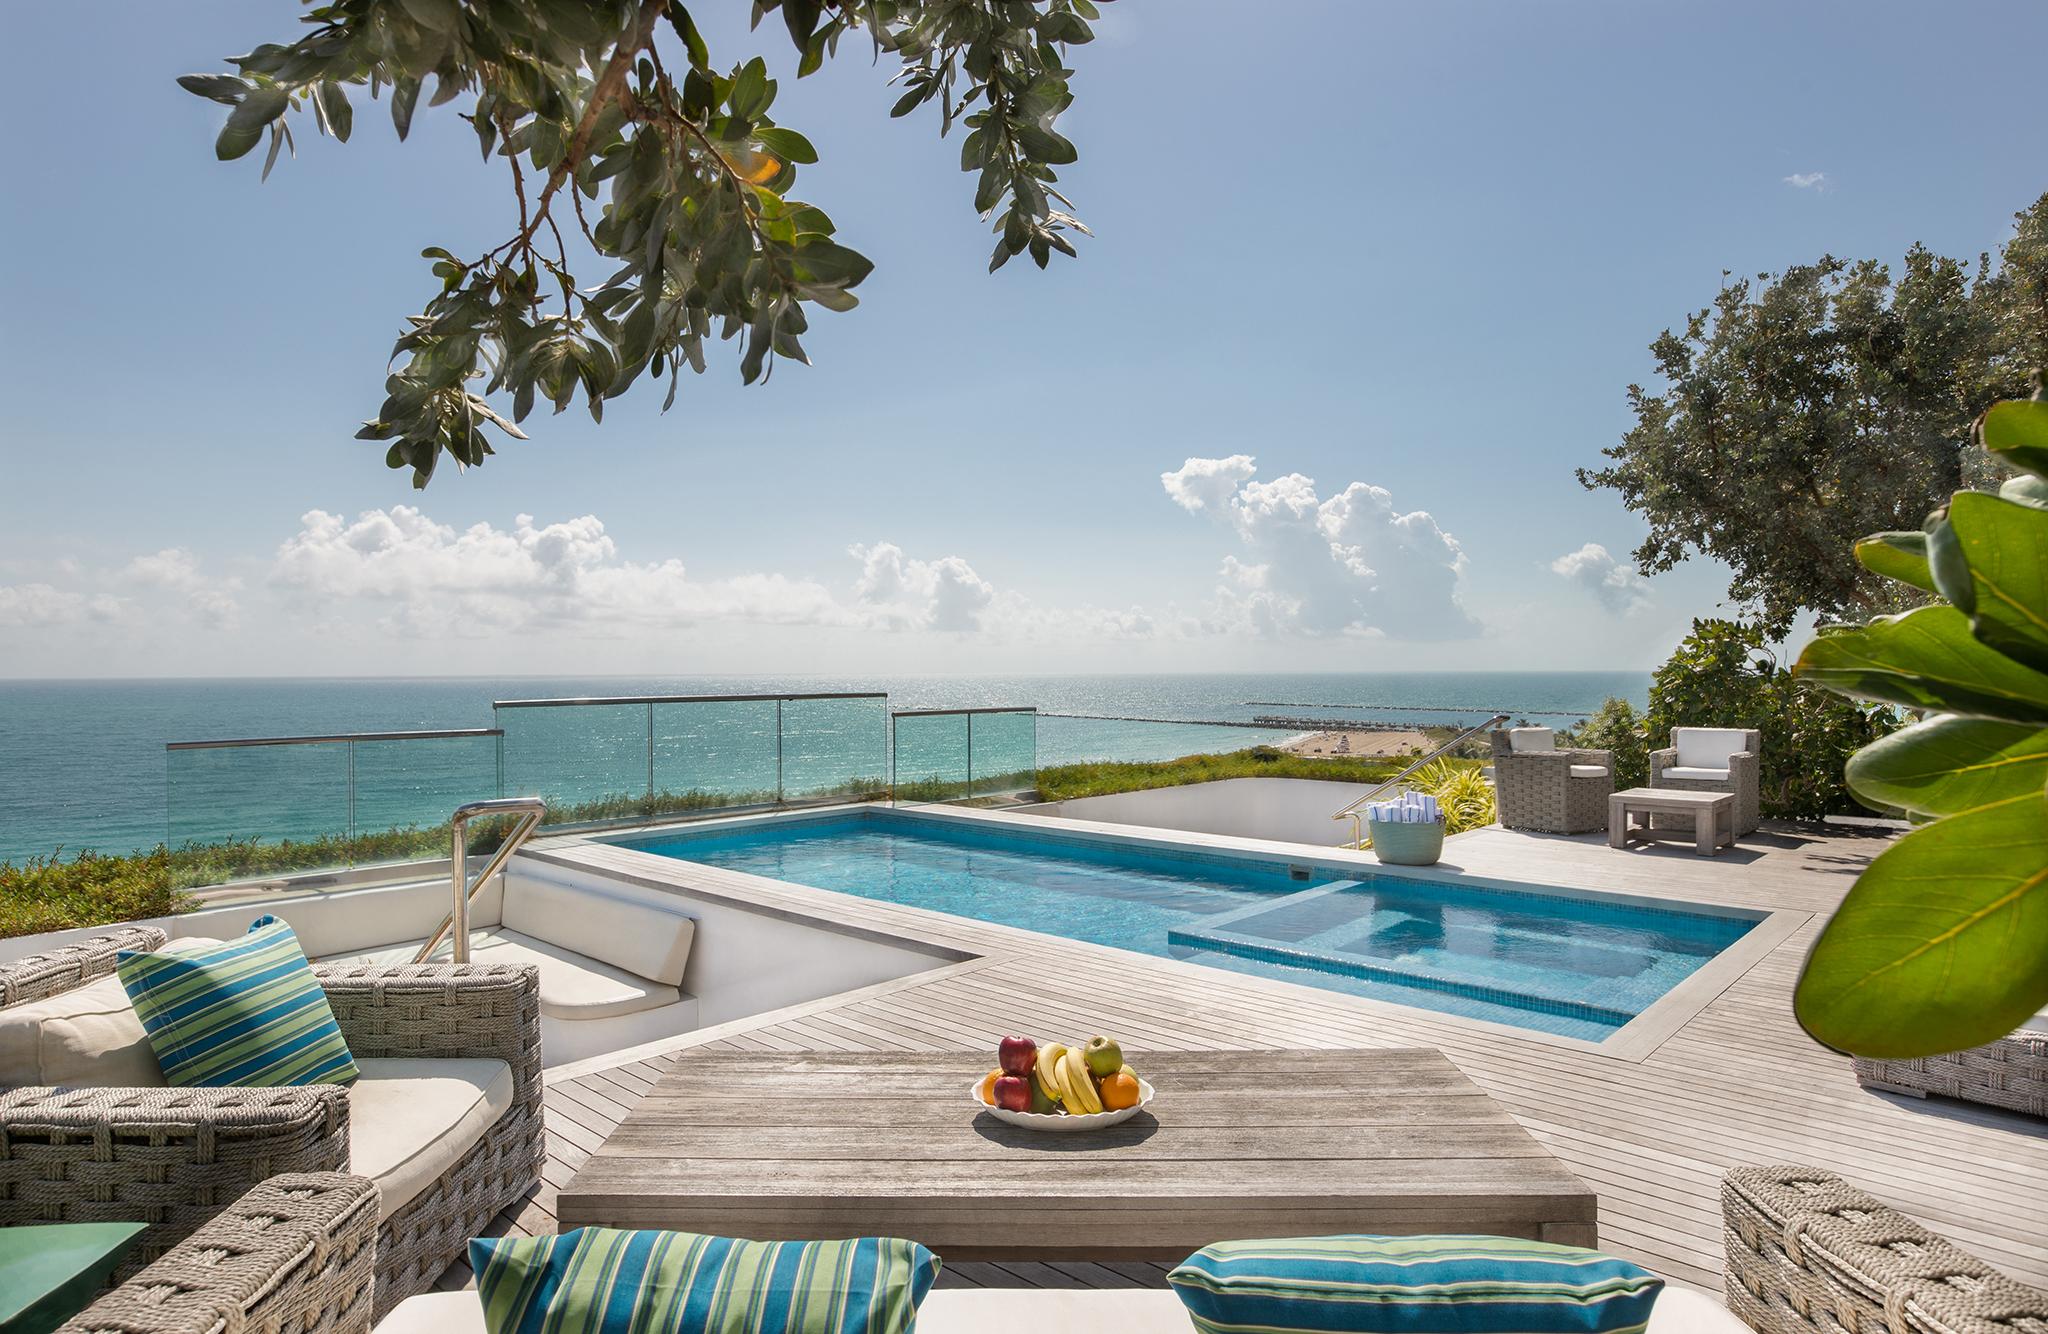 Hilton Bentley Miami South Beach Hotel Room 5